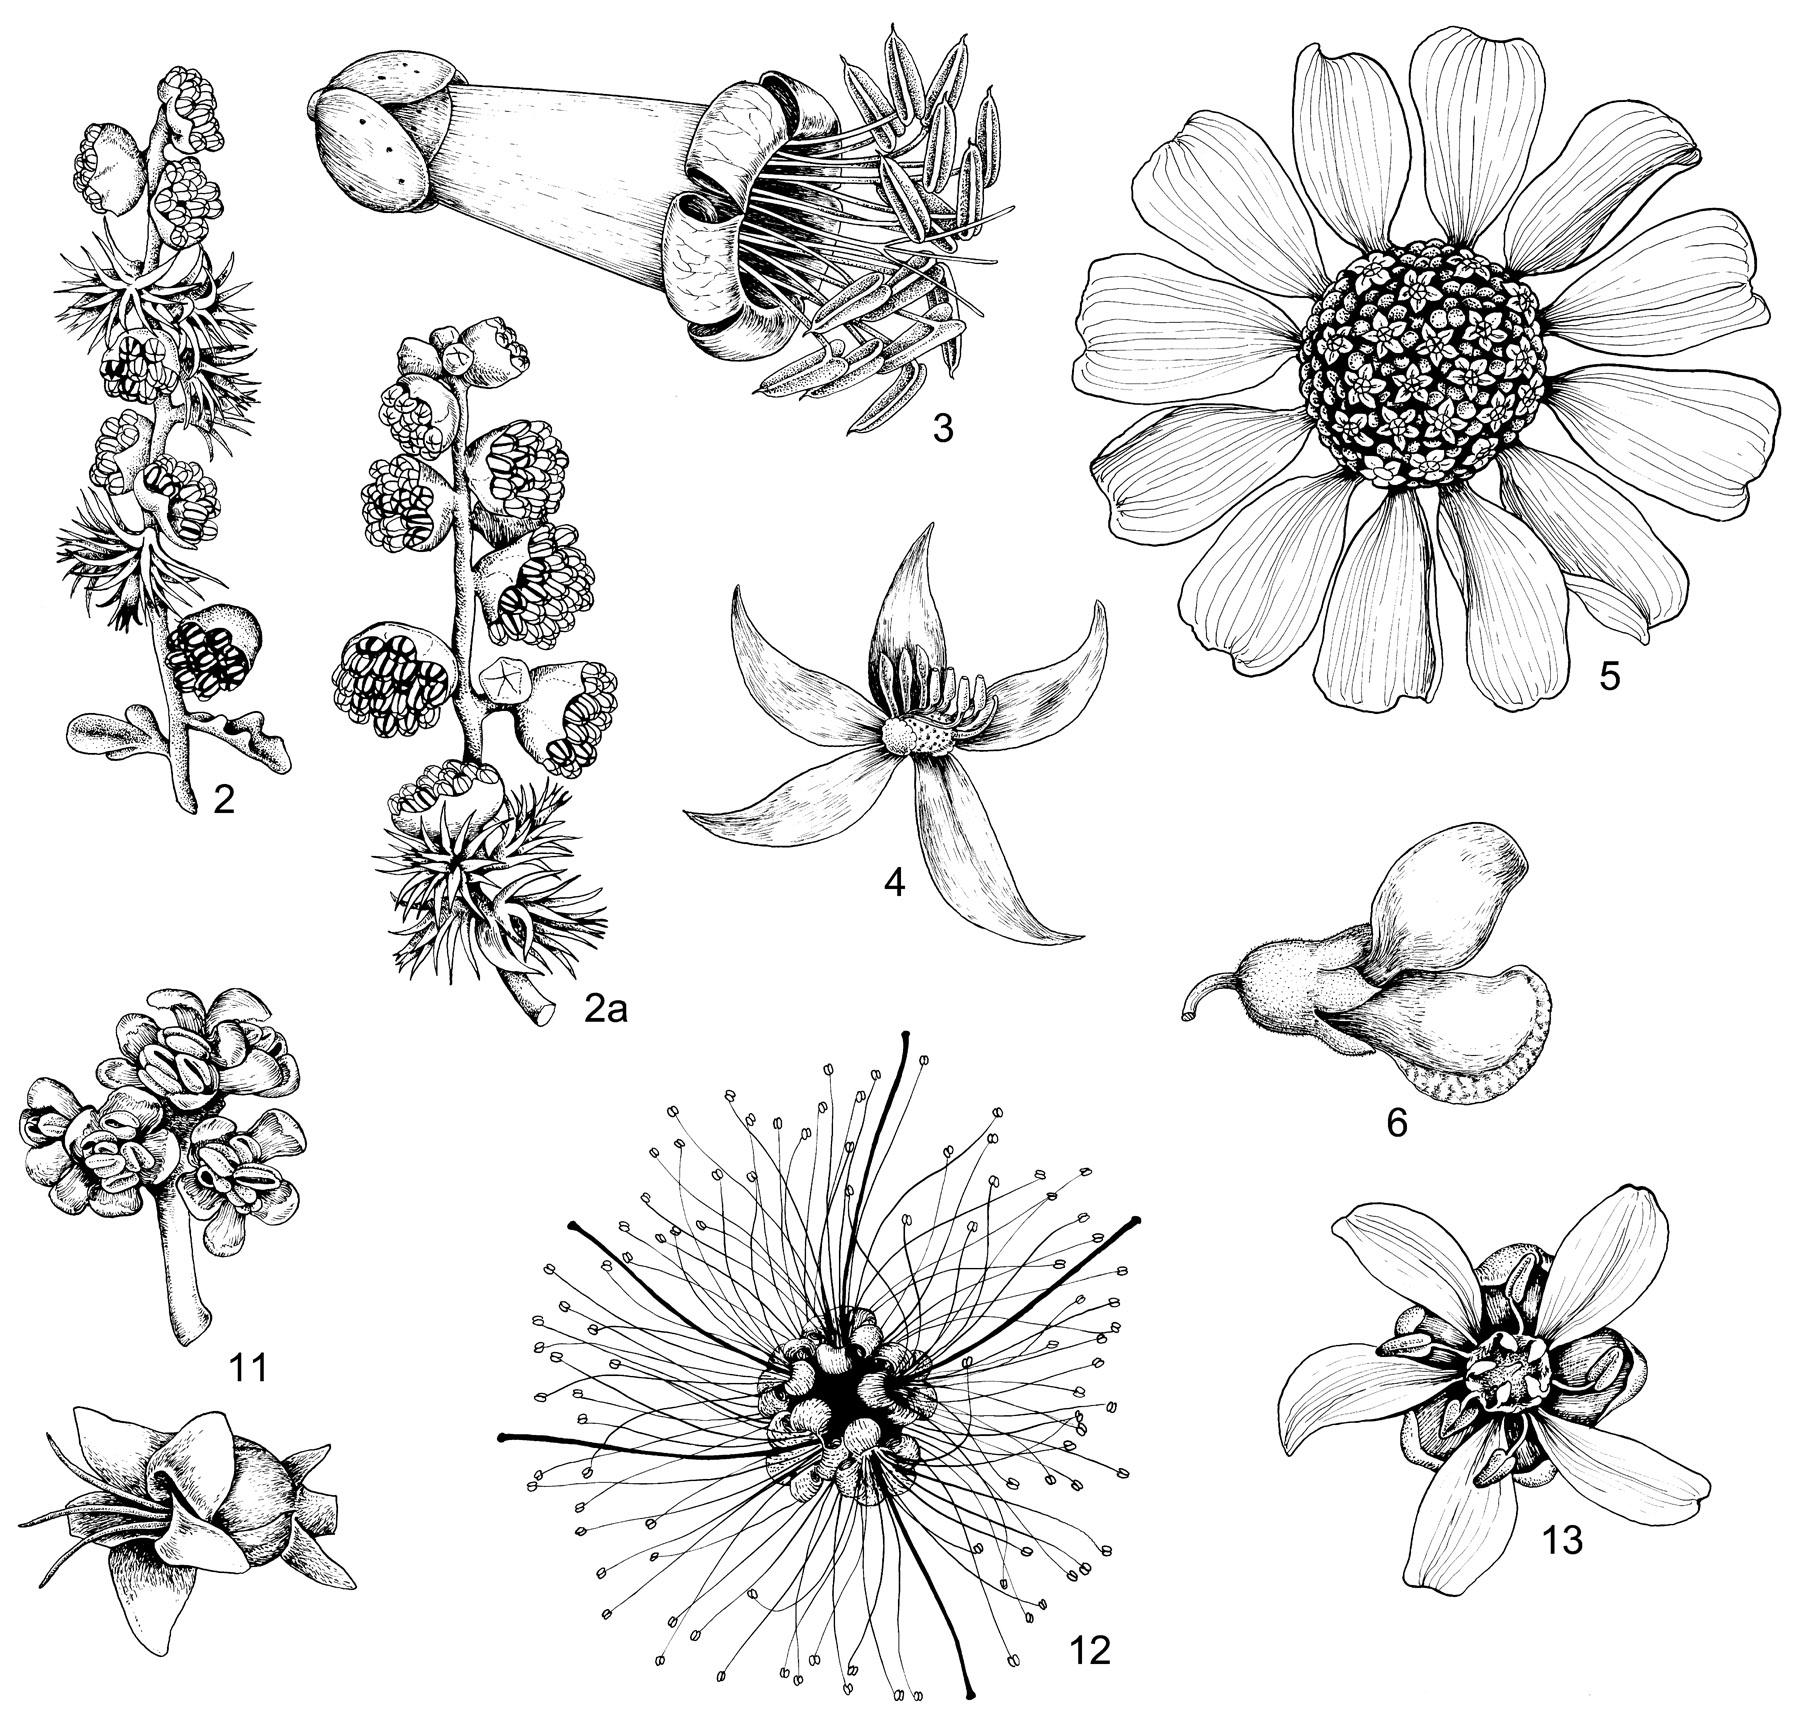 Drawn plant mexican flower Tangerini: Illustrations Perennial Alice Plants